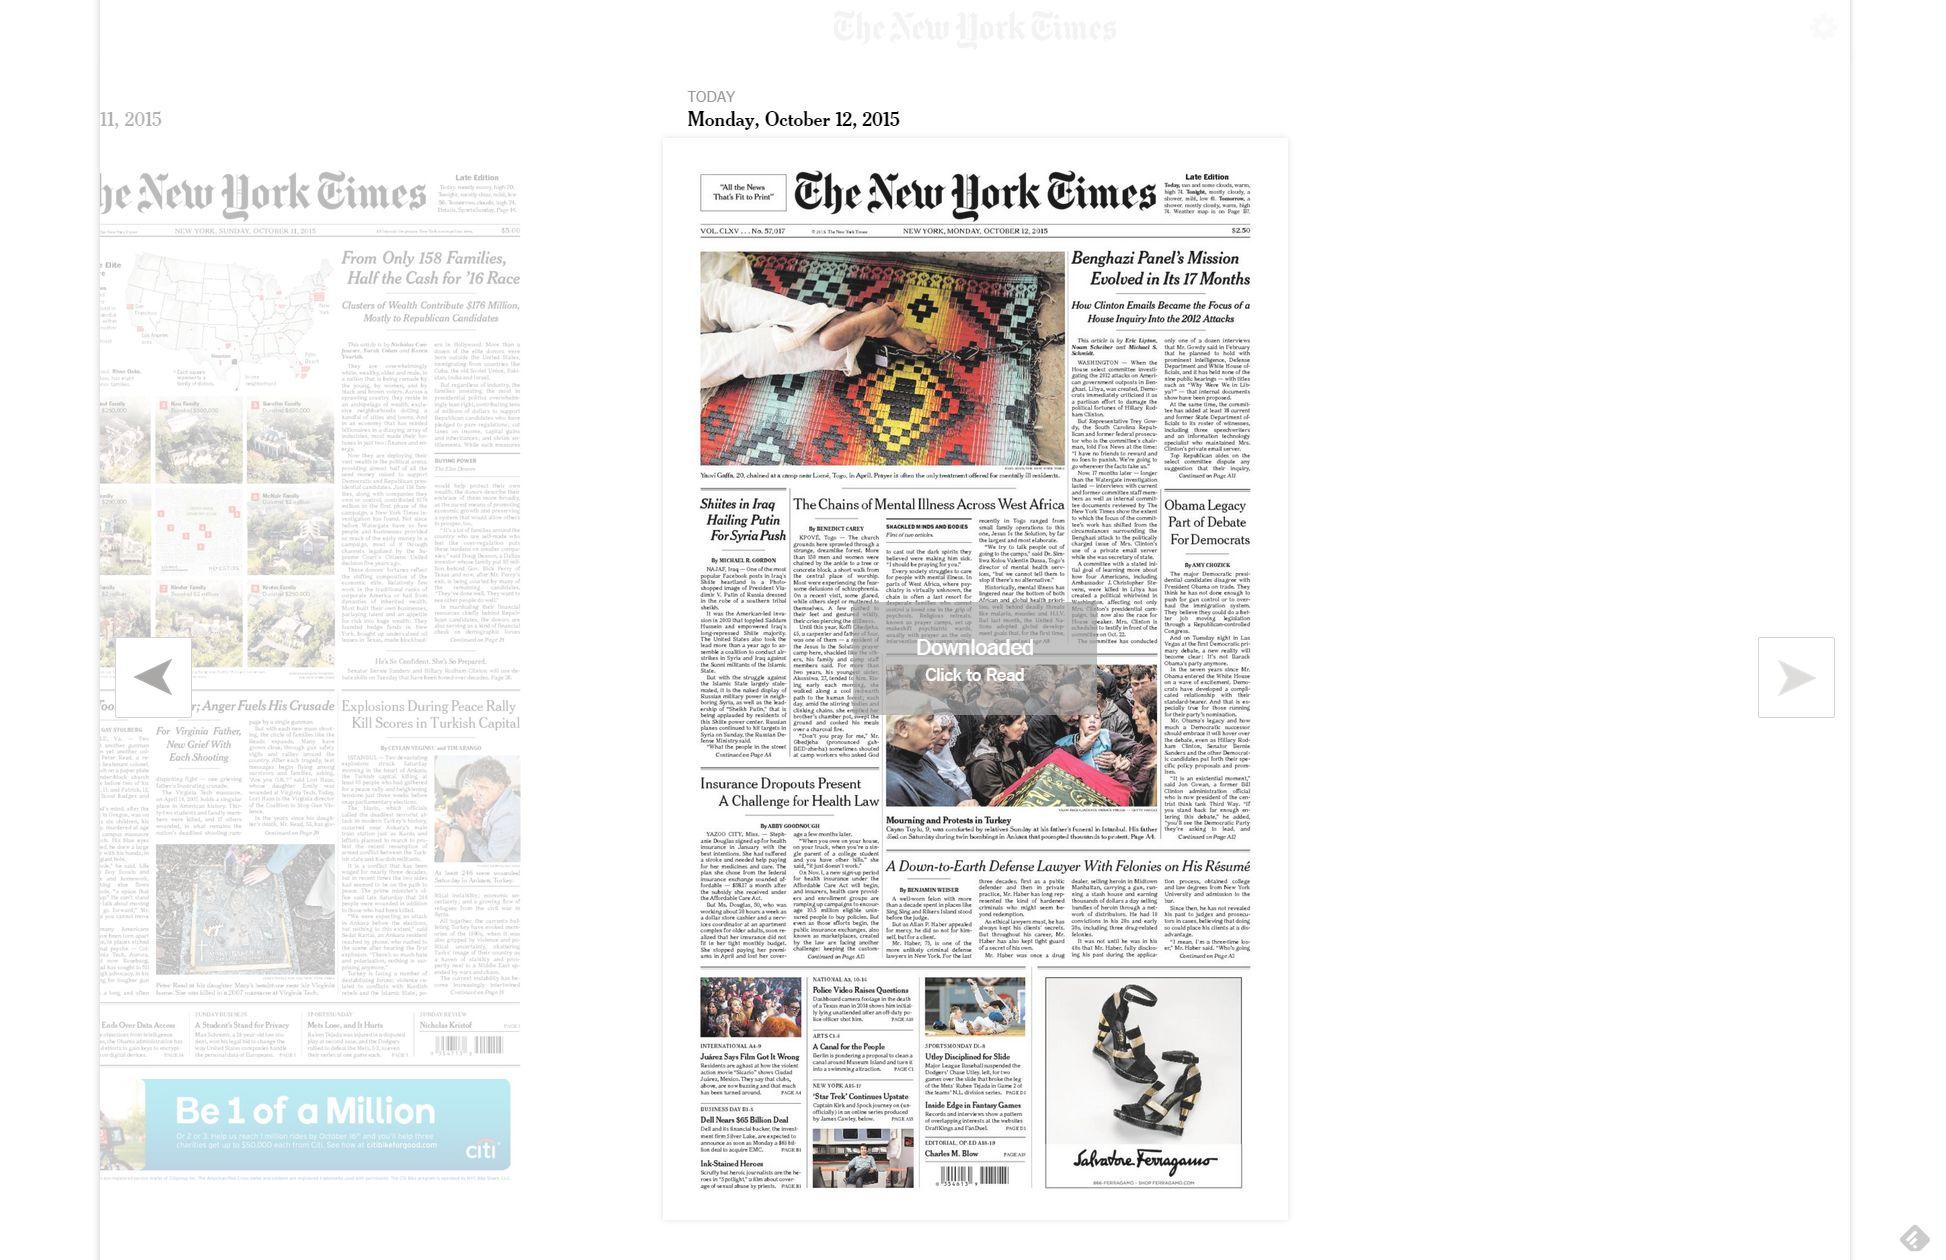 app.nytimes